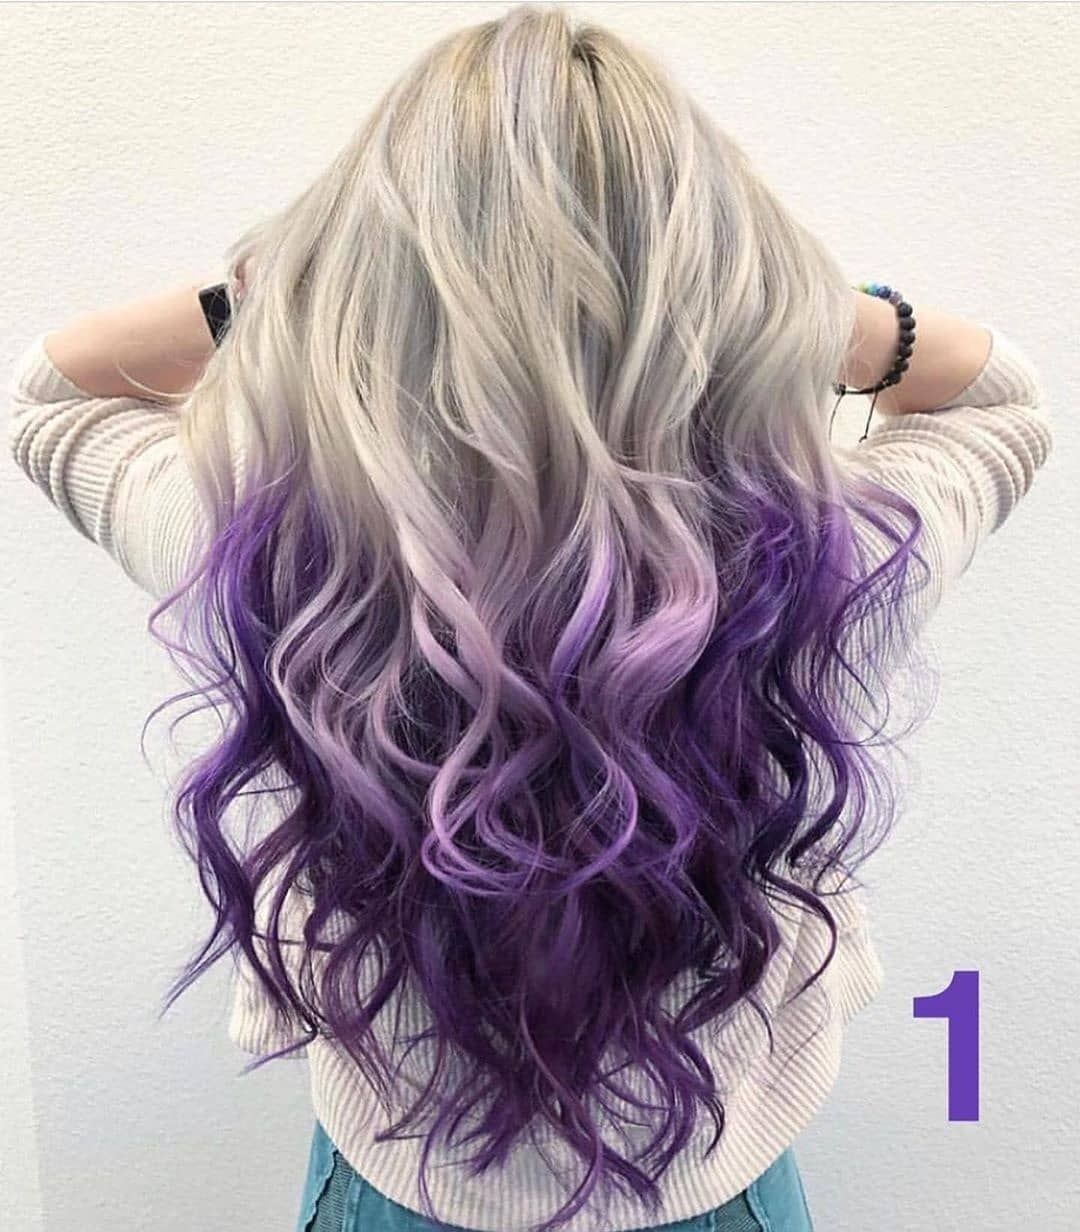 41.2 mil Me gusta, 1,223 comentarios - Your hair place (@hair.hd ...